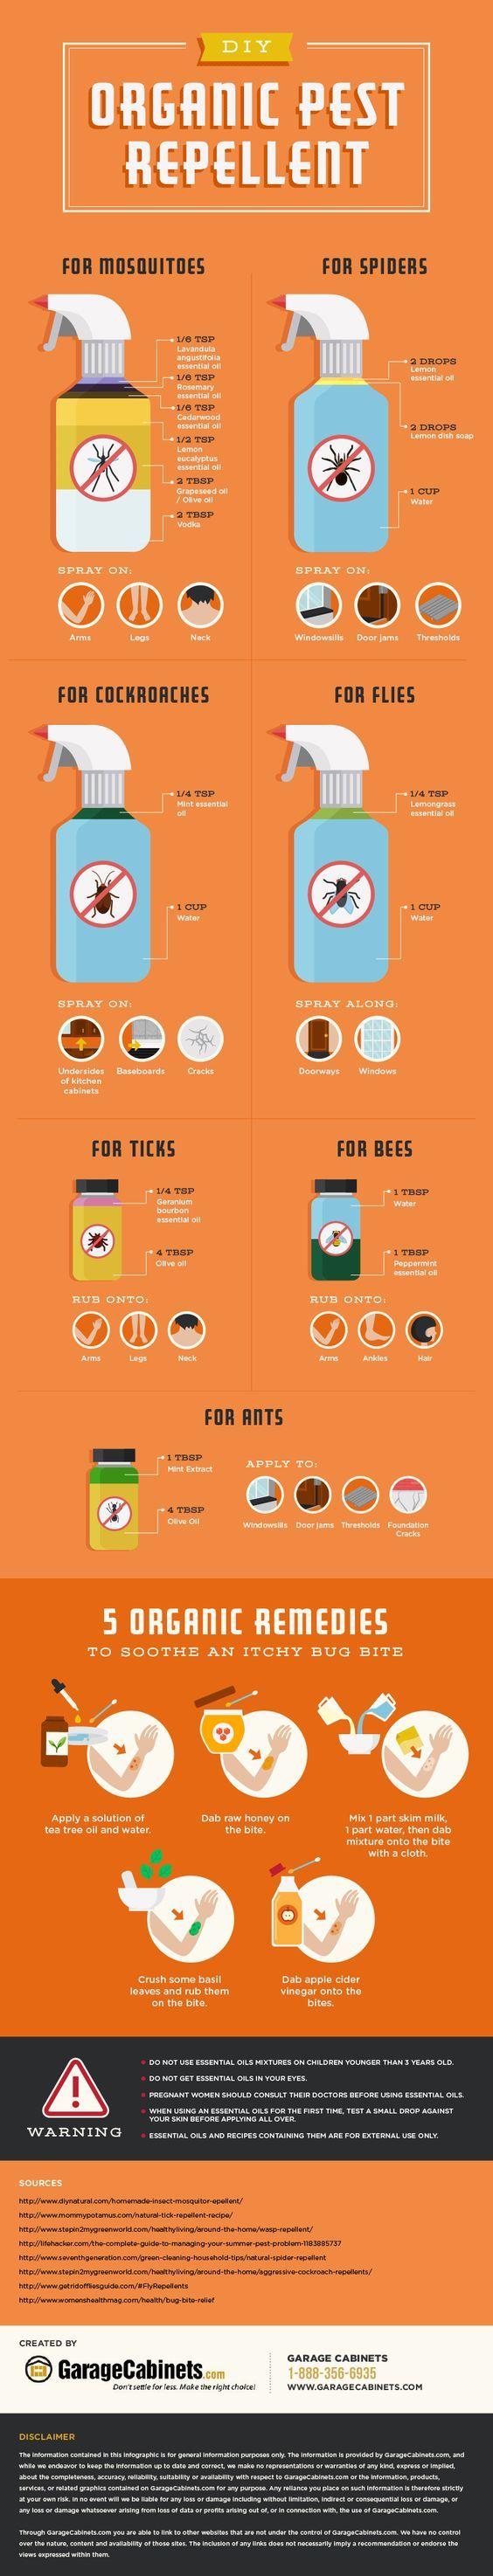 organic pest control chart - no link   essential oils   pinterest